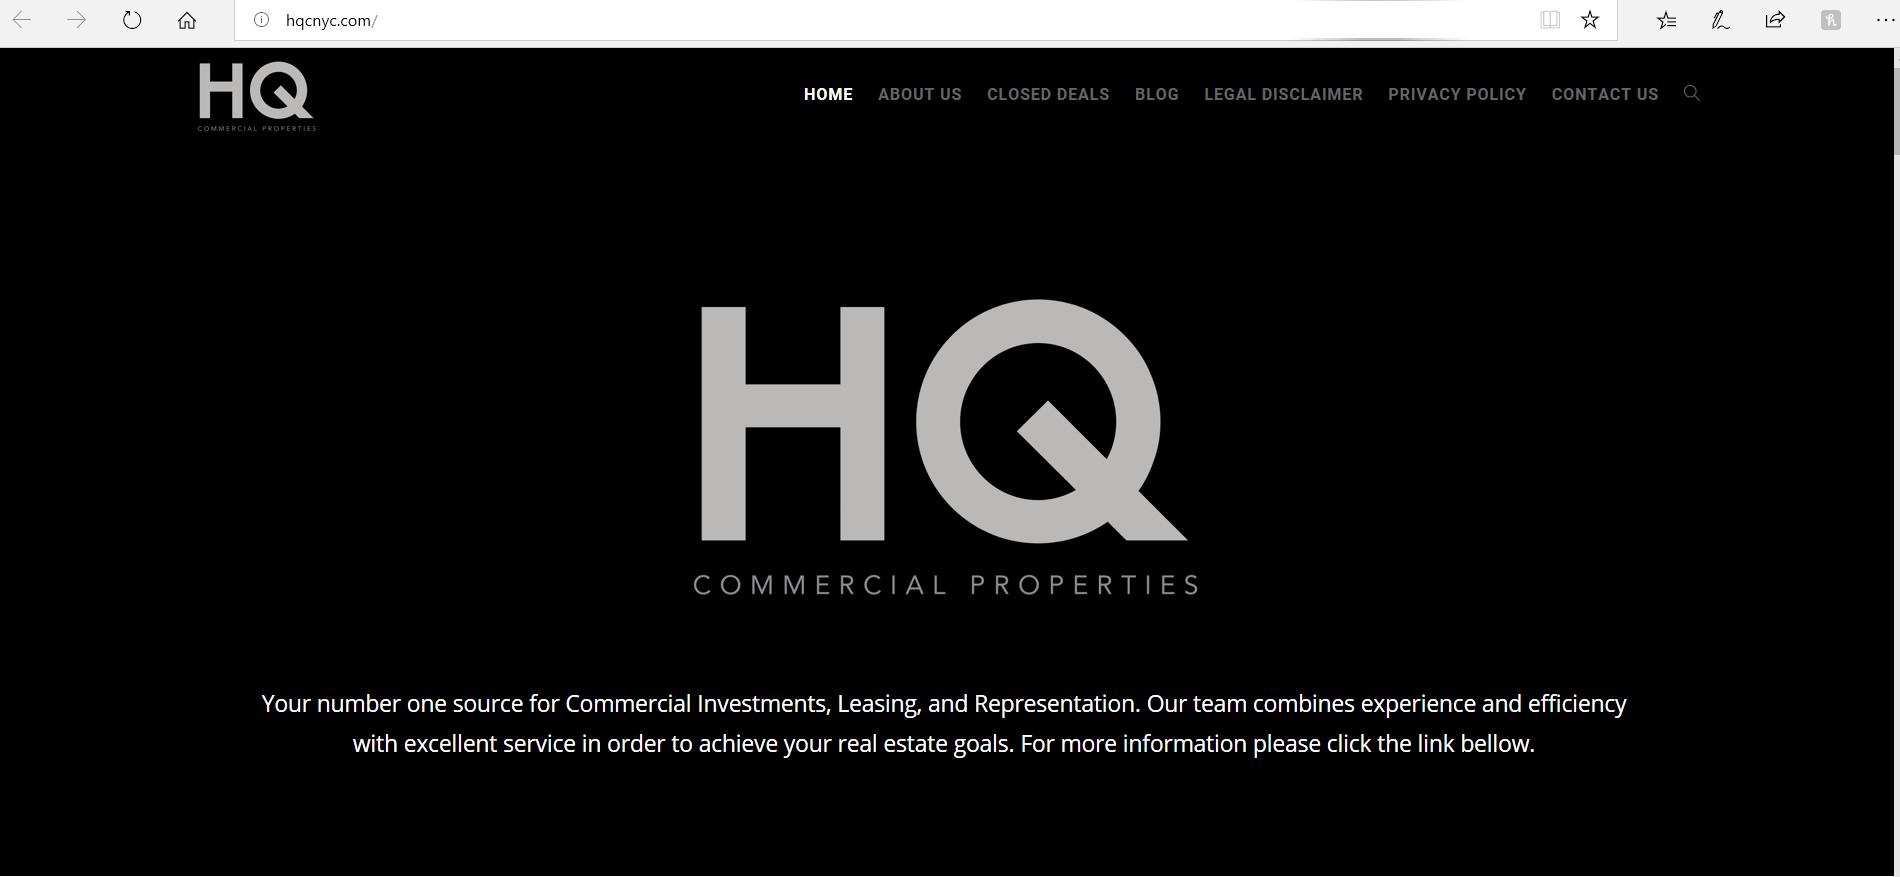 http://hqcnyc.com/